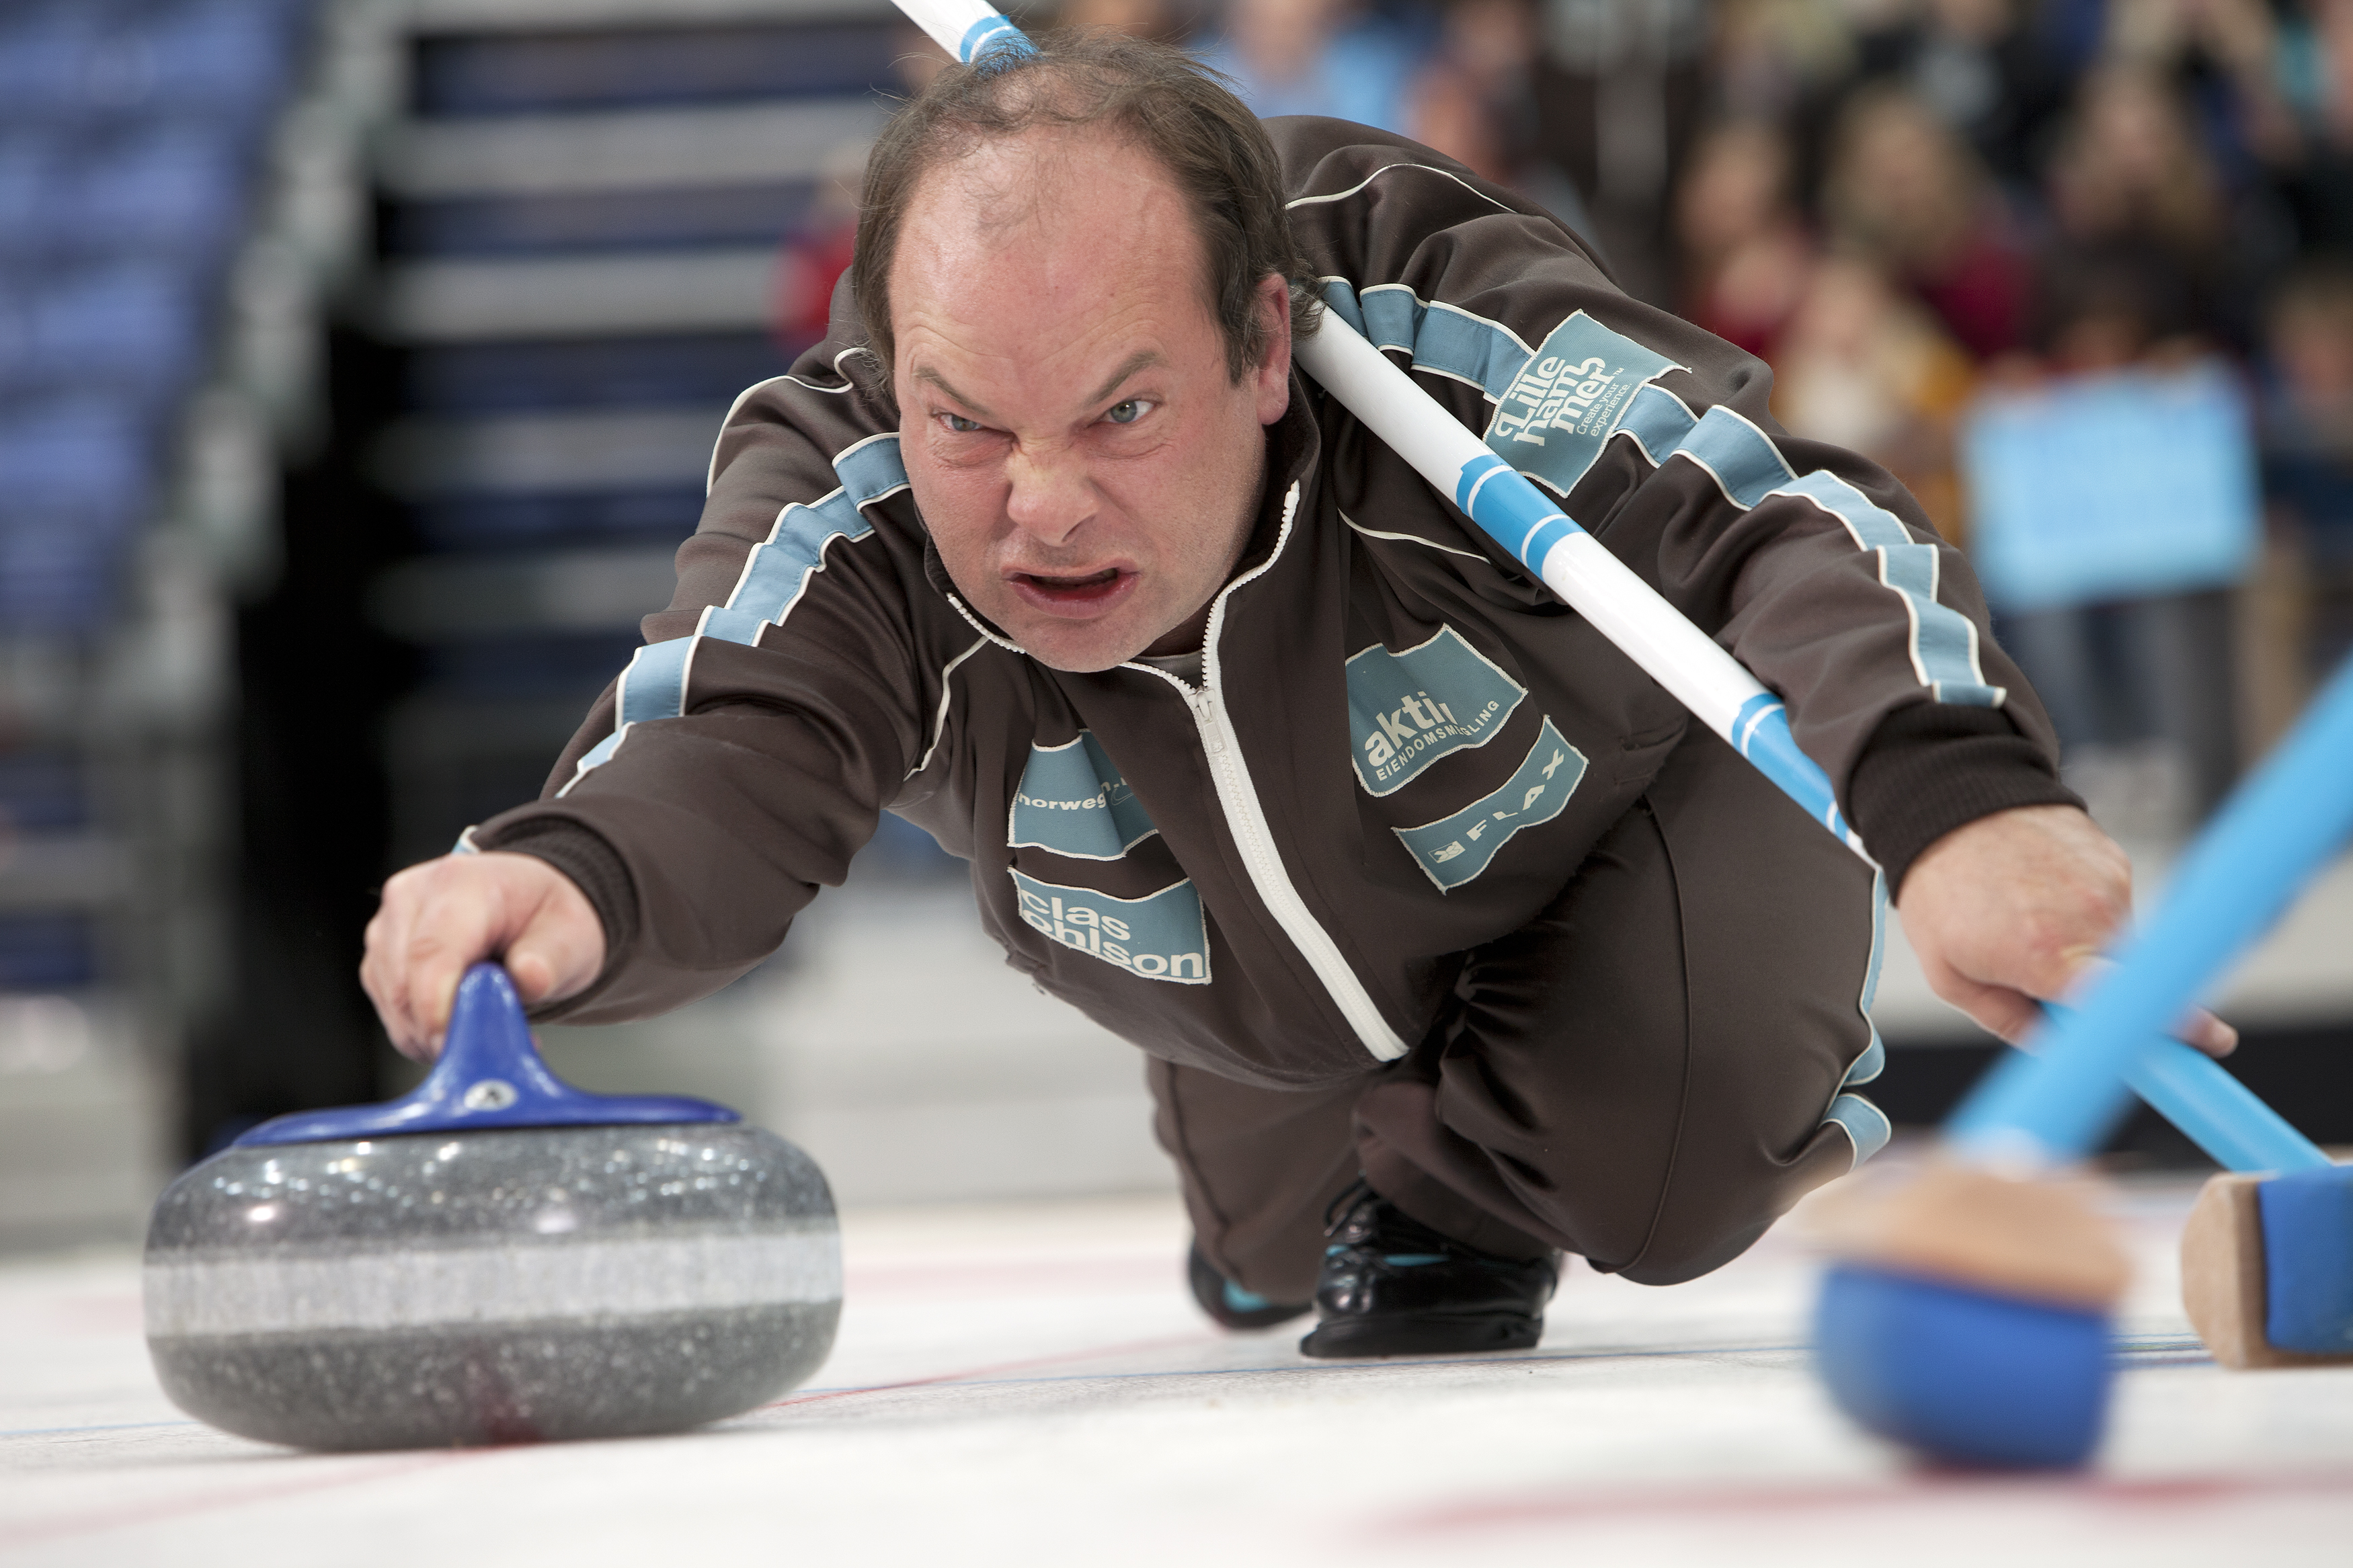 Curling Backgrounds, Compatible - PC, Mobile, Gadgets| 3500x2333 px